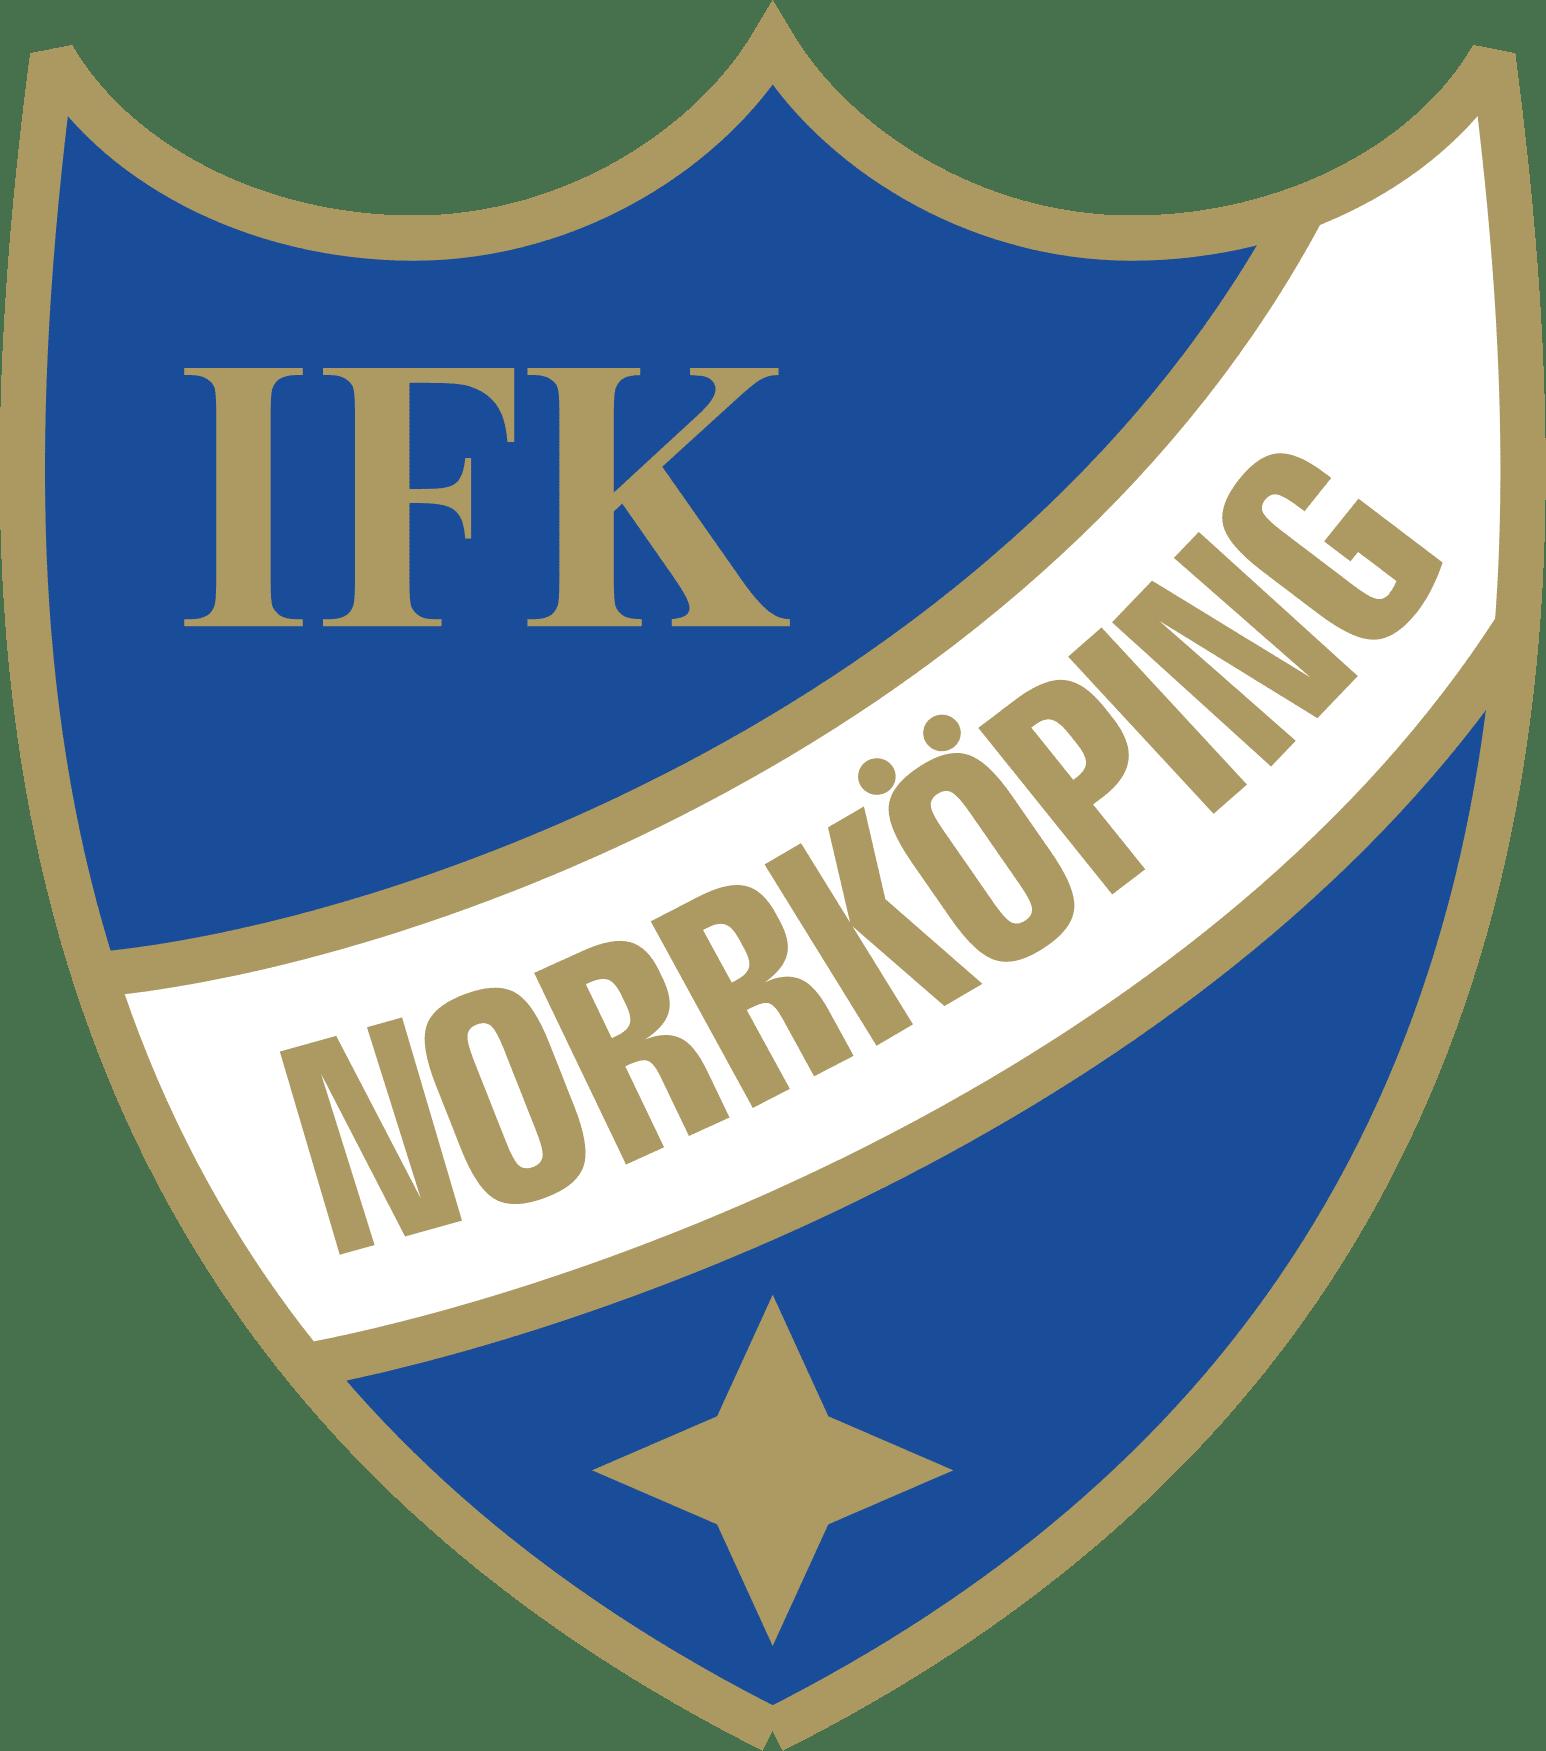 IFK_Norrköping_Logo